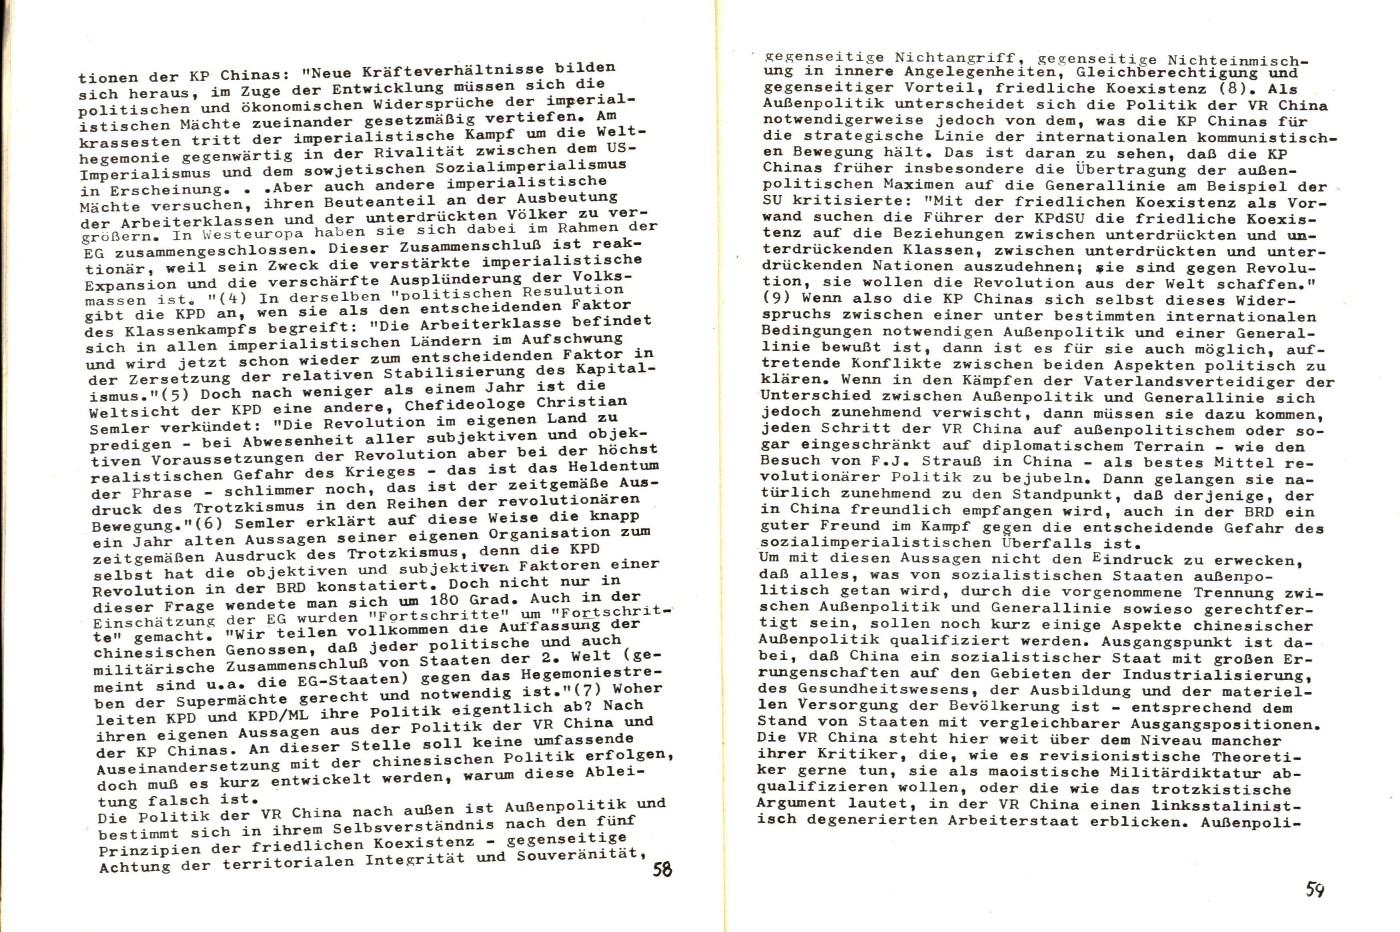 Berlin_KSV_1975_Dokumente_der_SAZ_31